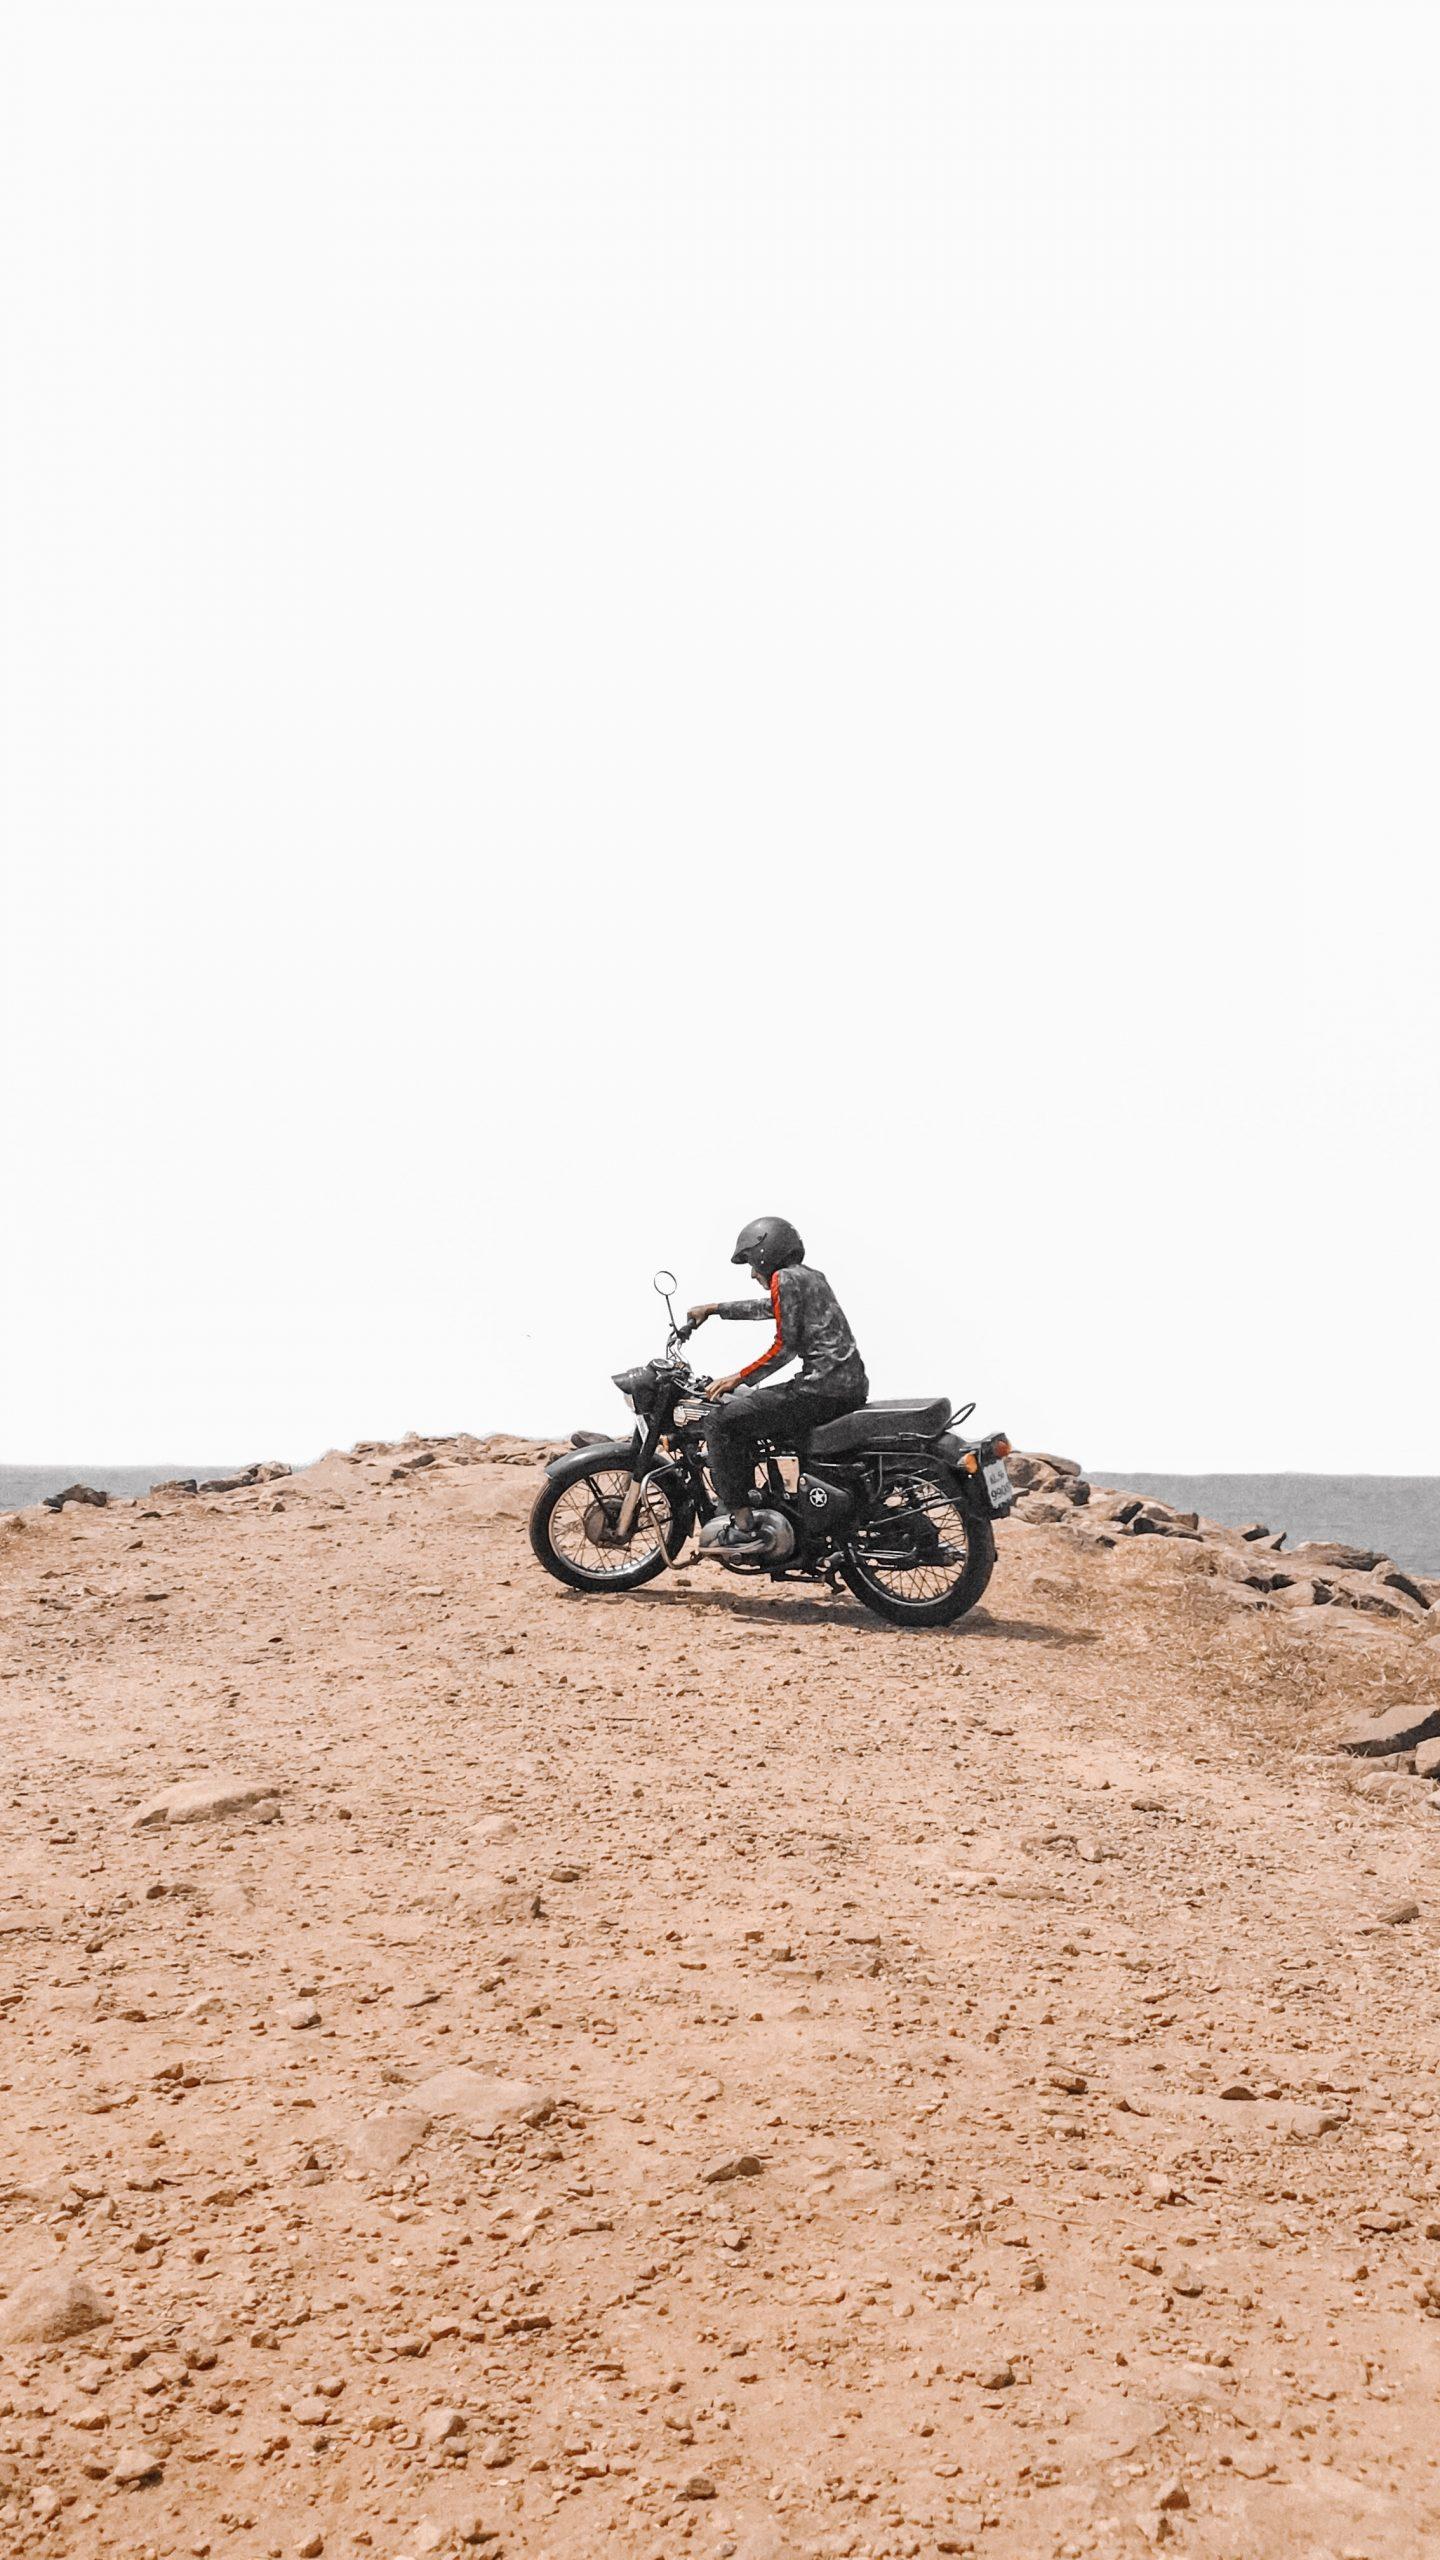 A bike rider on mountain top